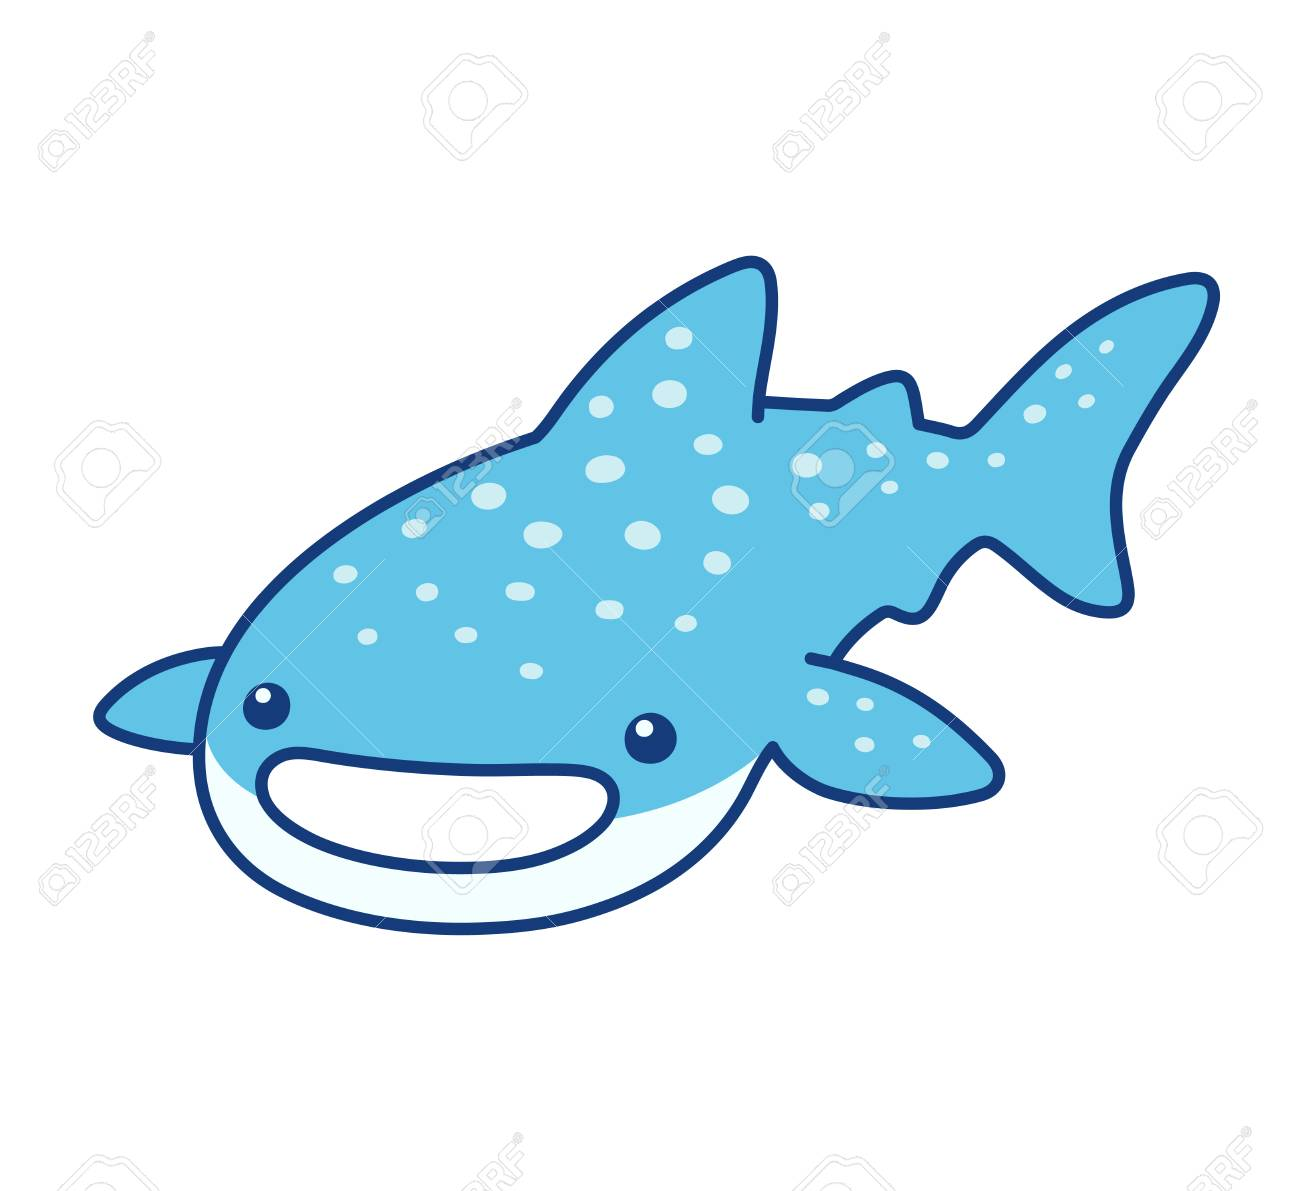 Cute Cartoon Whale Shark Drawing Funny Character Vector